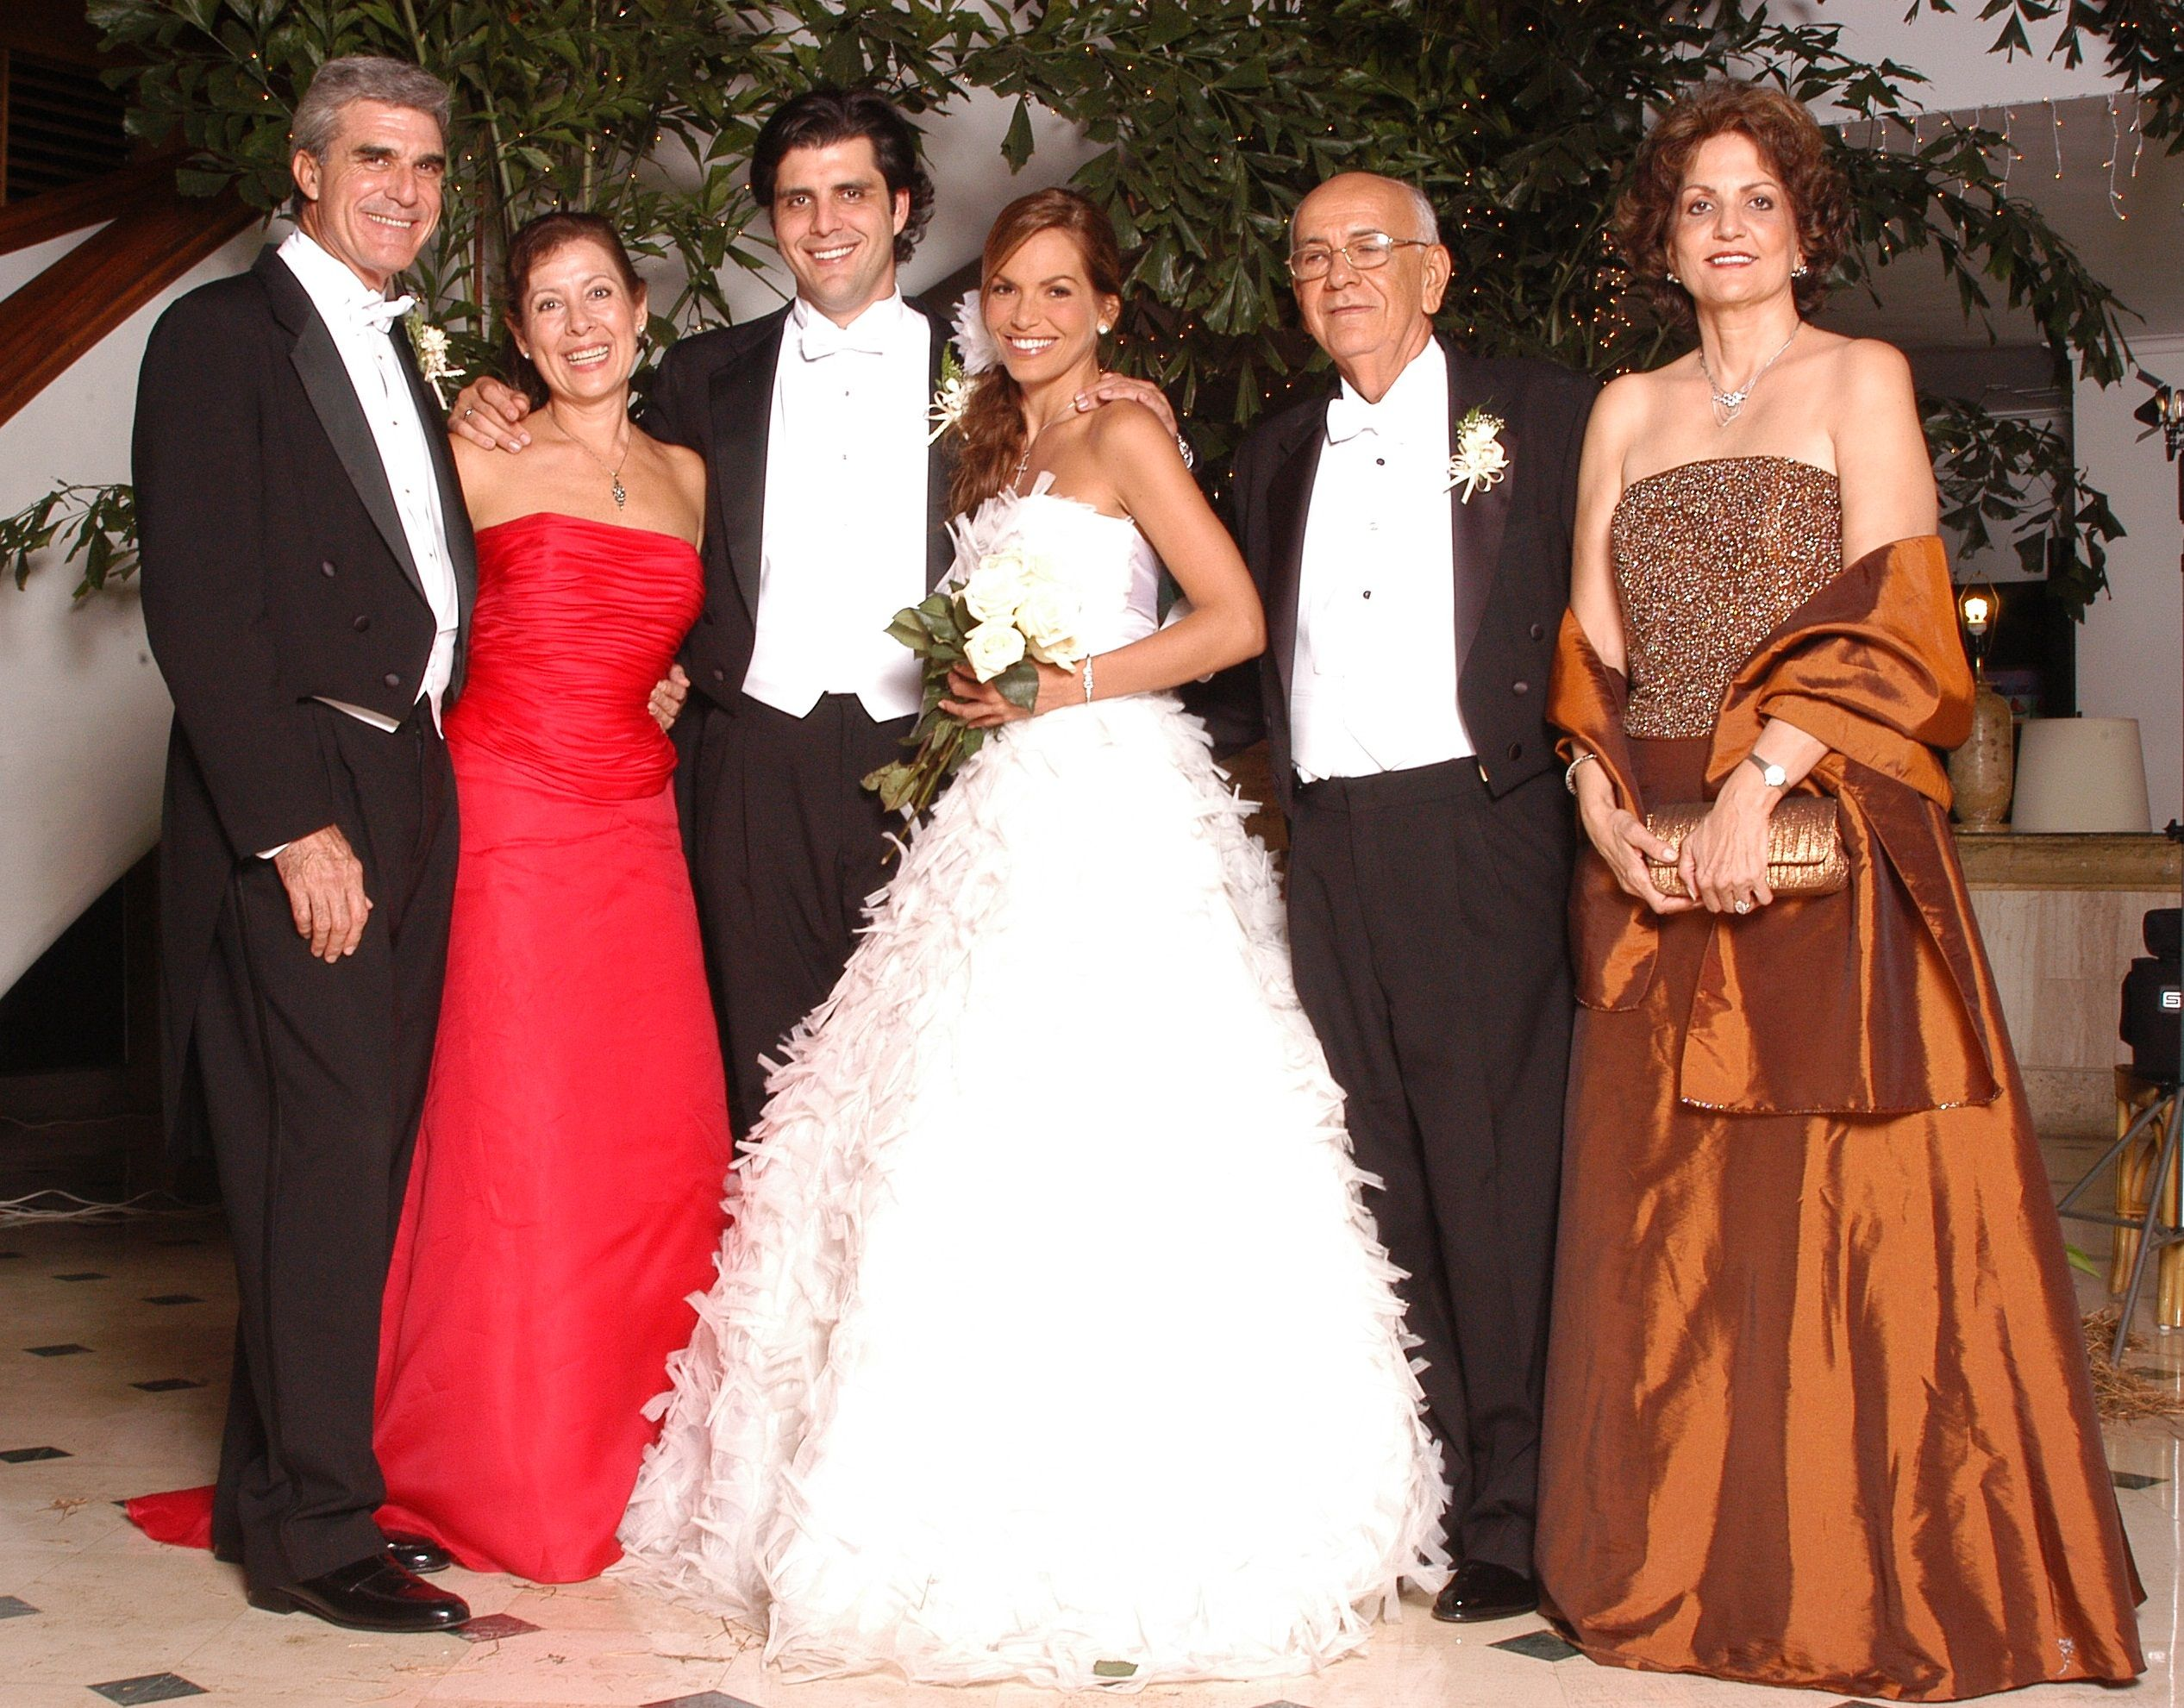 Maria jose barraza wearing silvia tcherassi for her wedding on maria jose barraza wearing silvia tcherassi for her wedding on november 2003 bridal ombrellifo Image collections